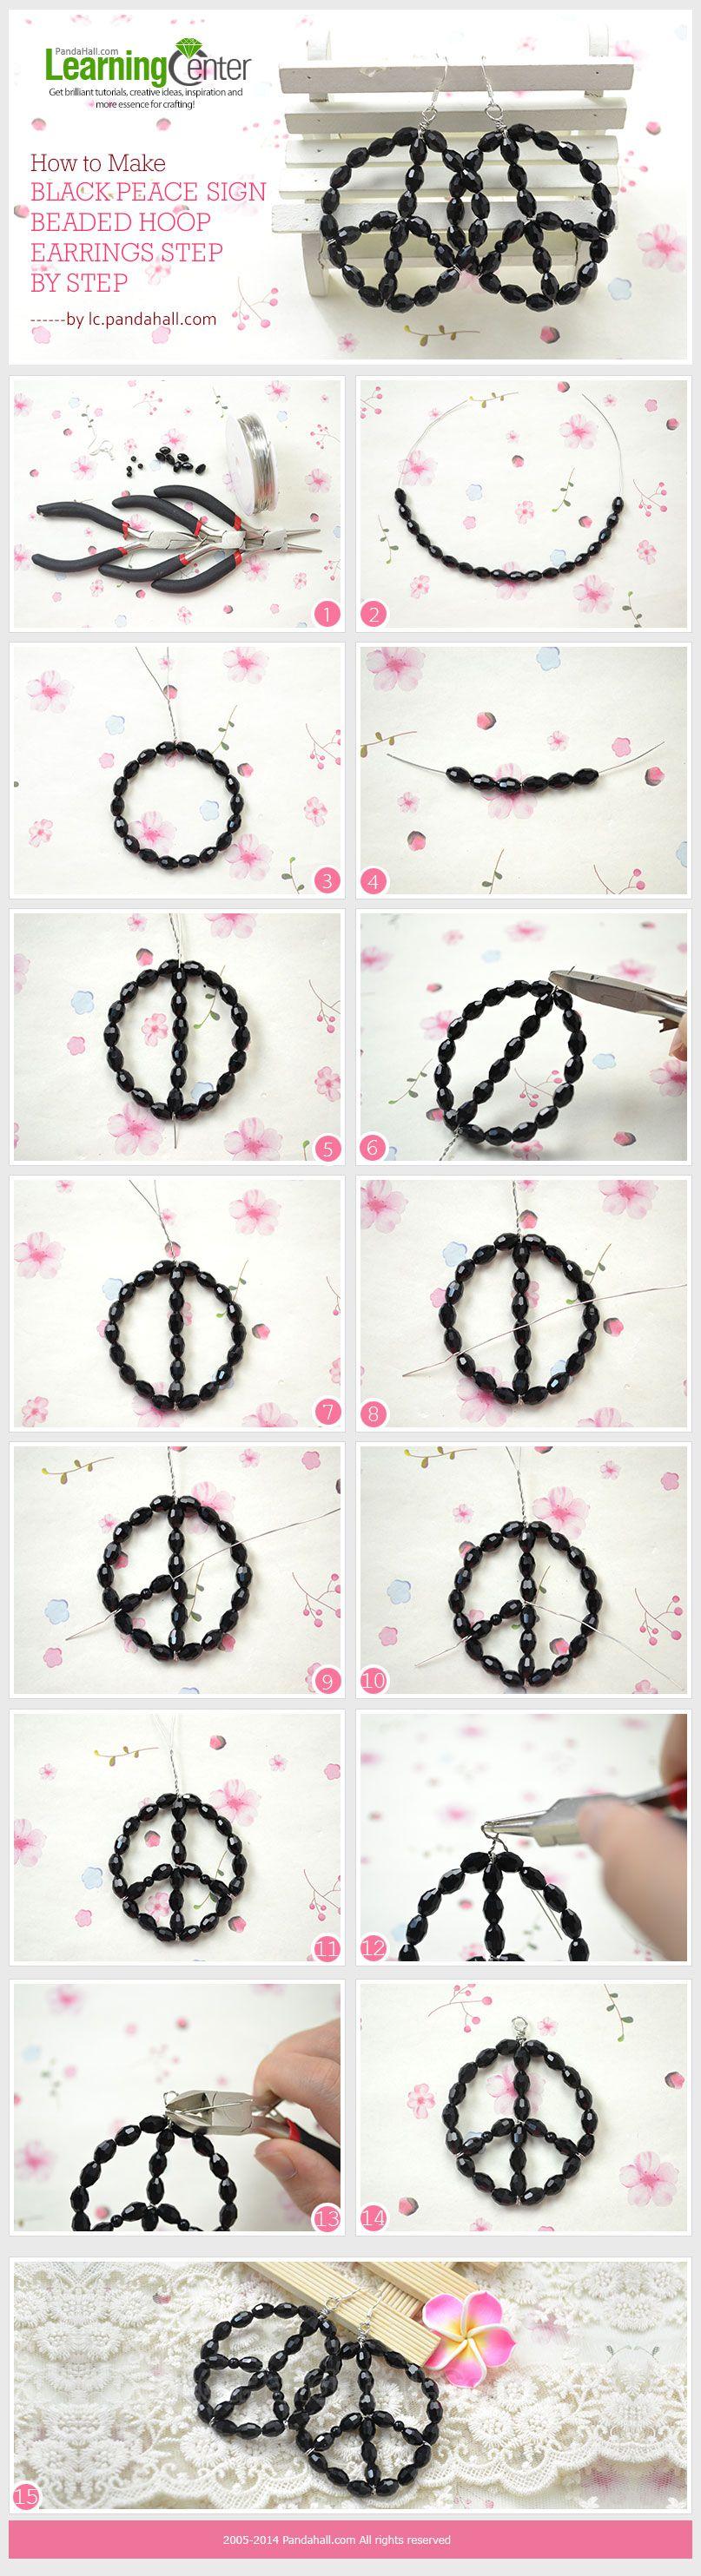 How to Make Black Peace Sign Beaded Hoop Earrings Step by